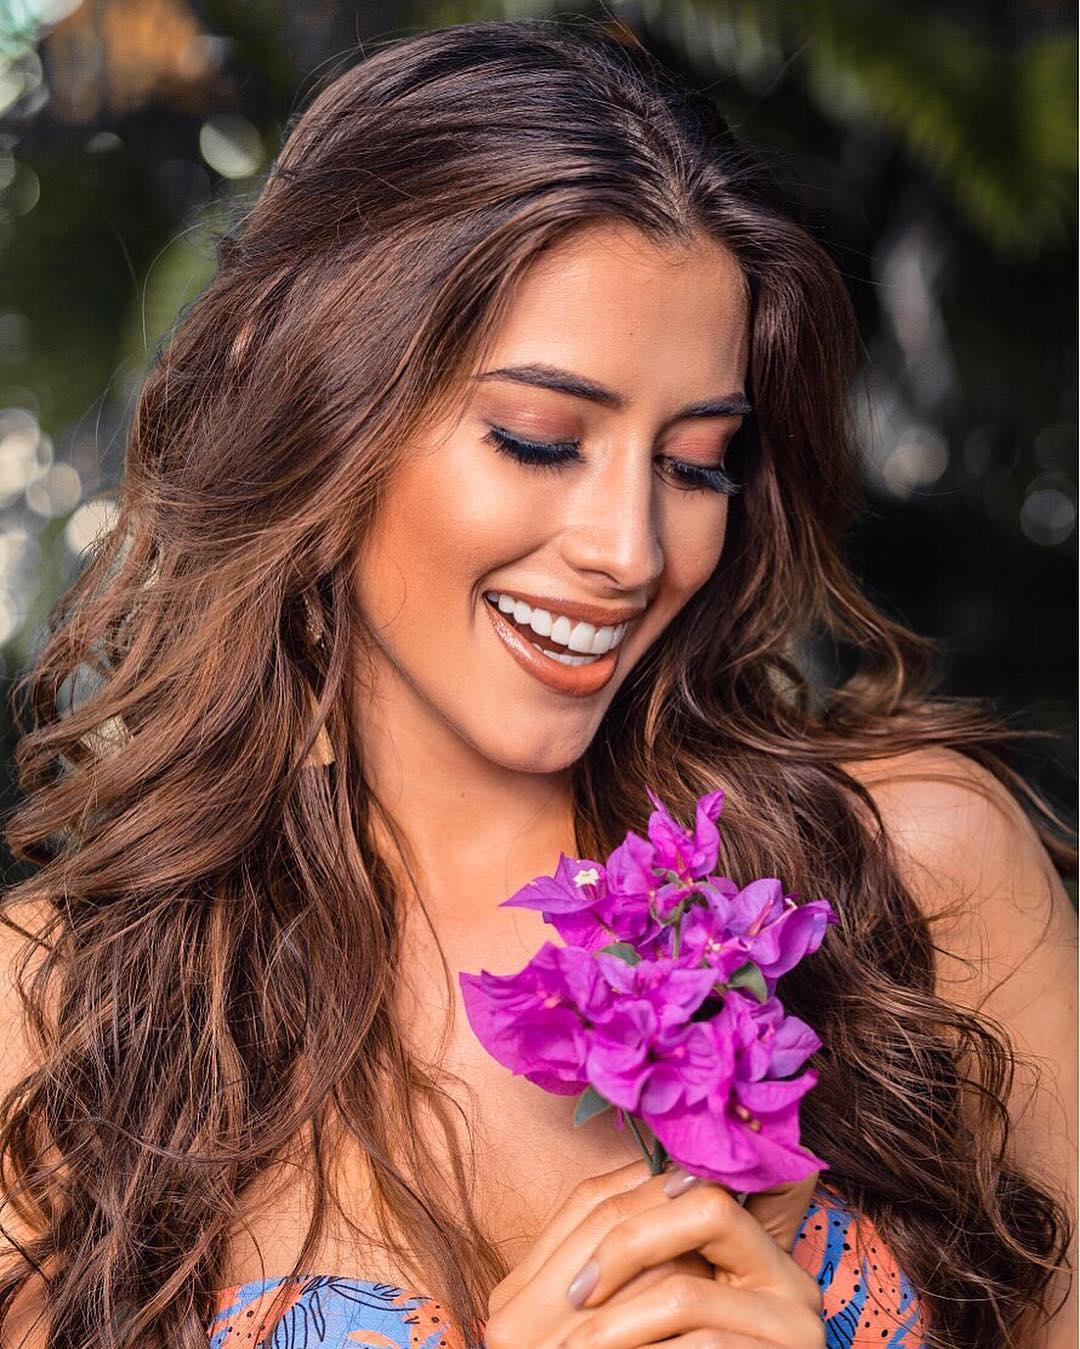 laura claro, primera finalista de reyna hispanoamericana 2019. 44869410